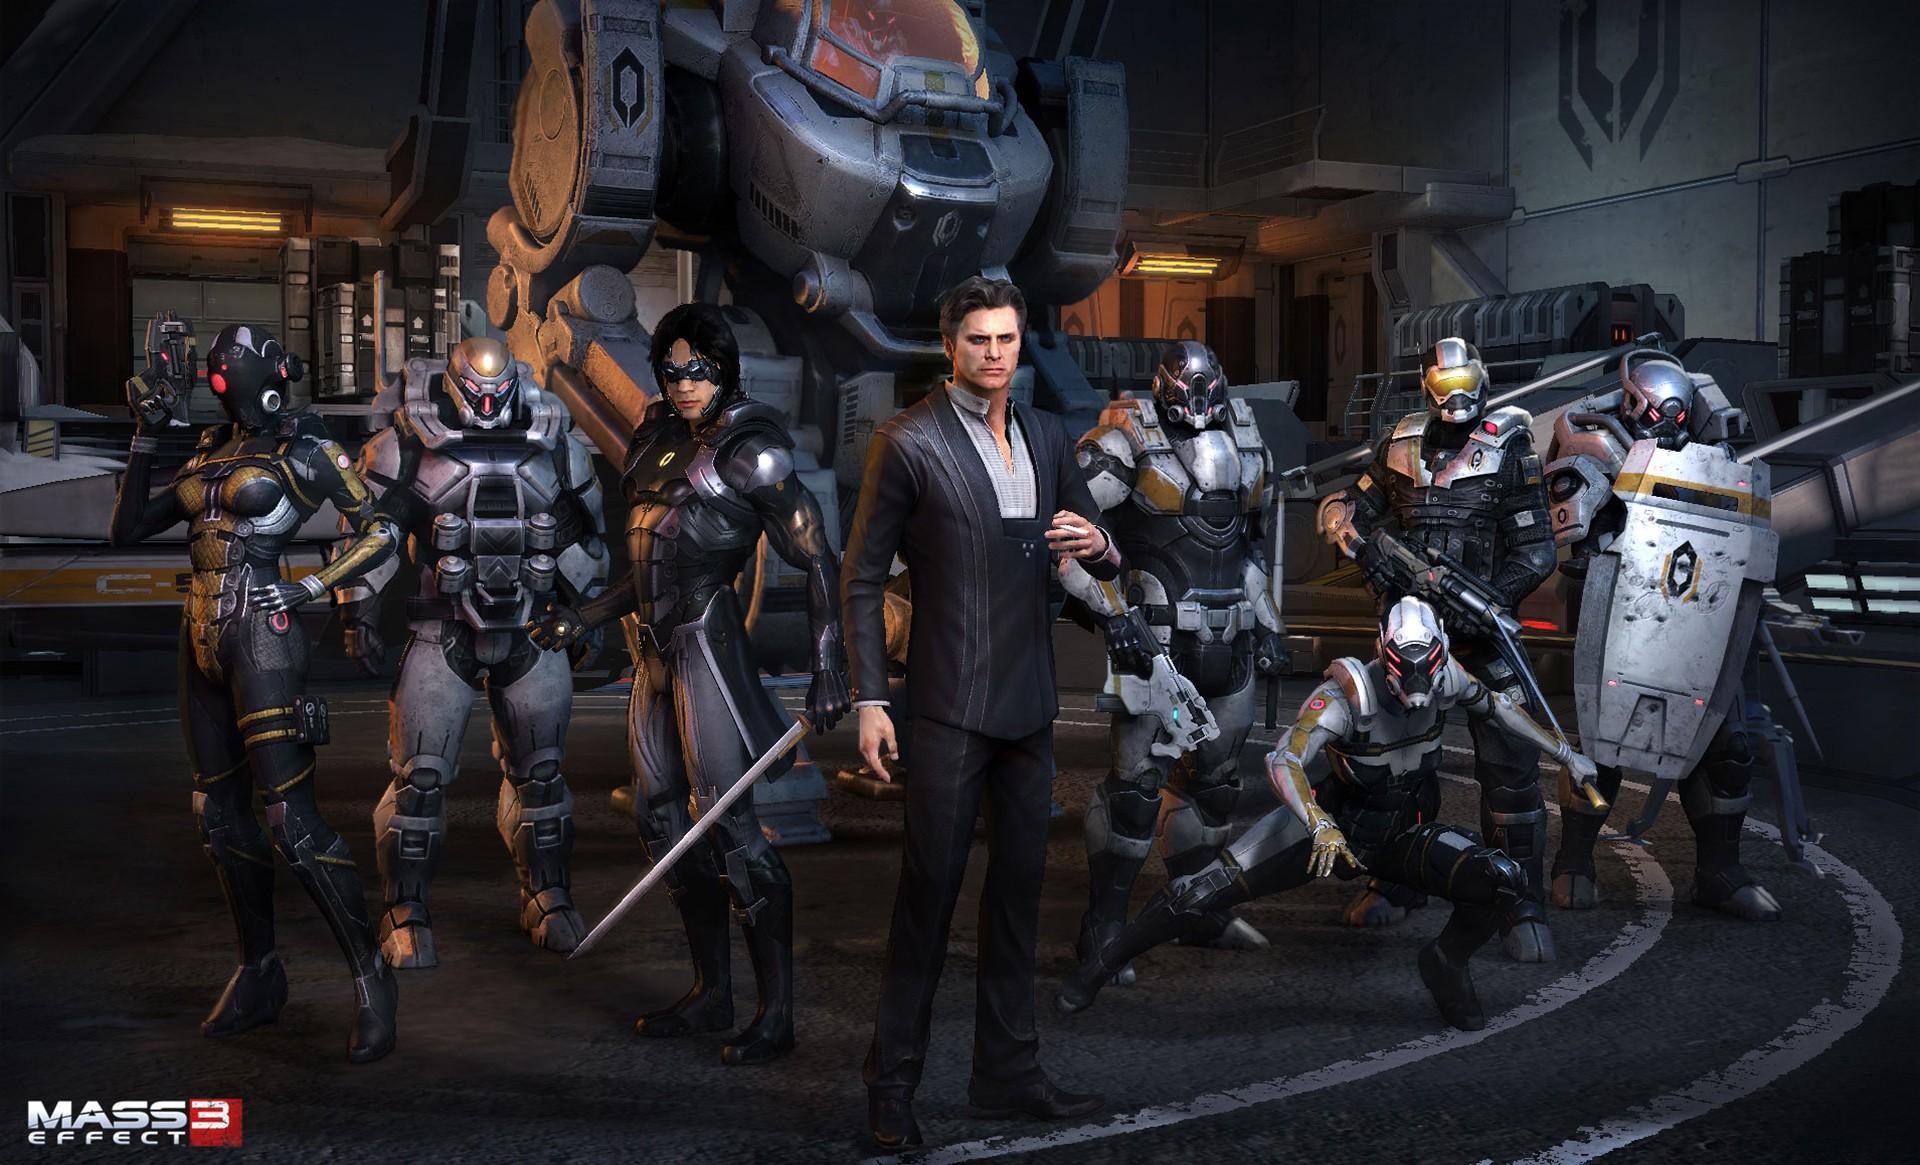 General 1920x1165 Mass Effect Mass Effect 3 Cerberus  digital art artwork render Illusive Man 3D CGI video game art video game man video game girls science fiction women Science Fiction Men PC gaming